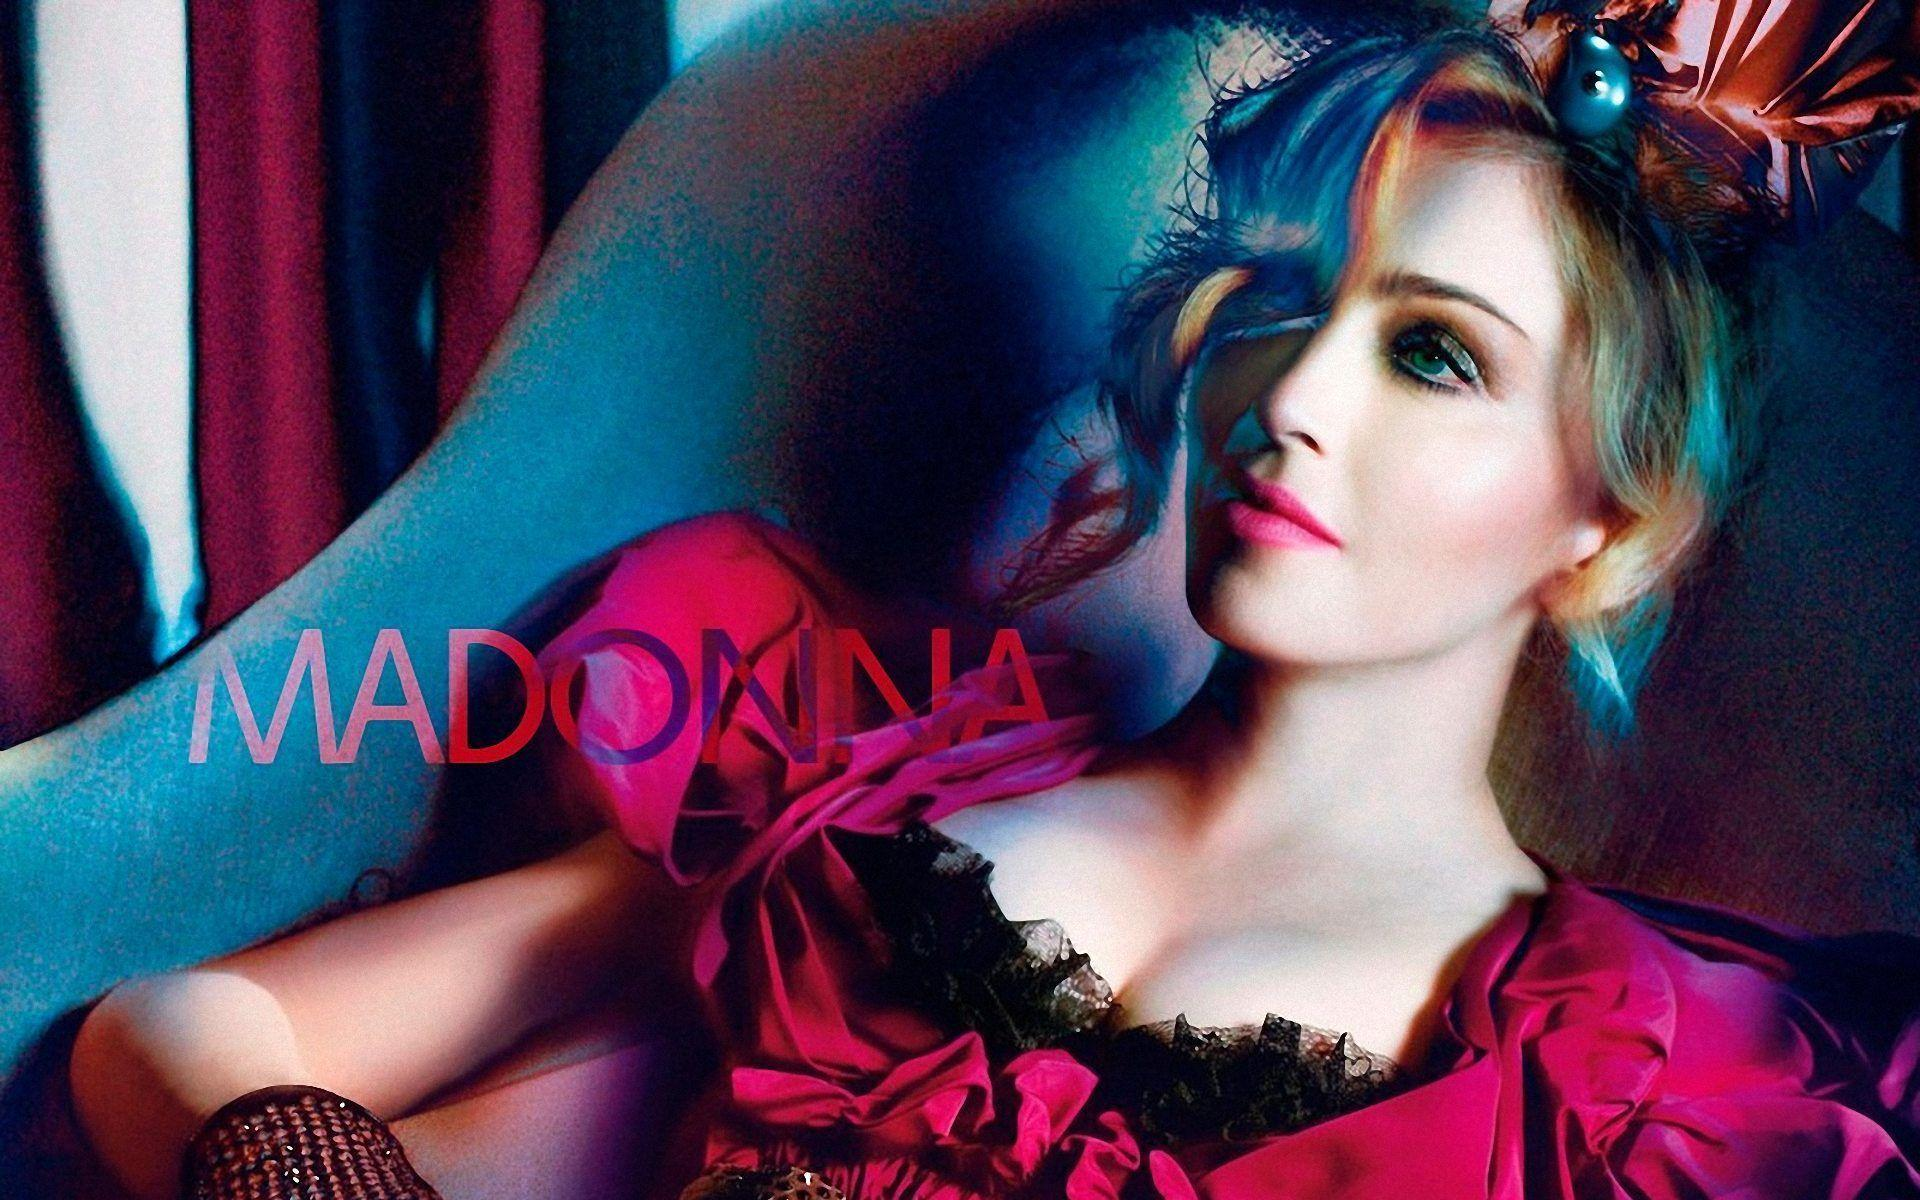 Madonna hd wallpapers wallpaper cave - Madonna hd images ...